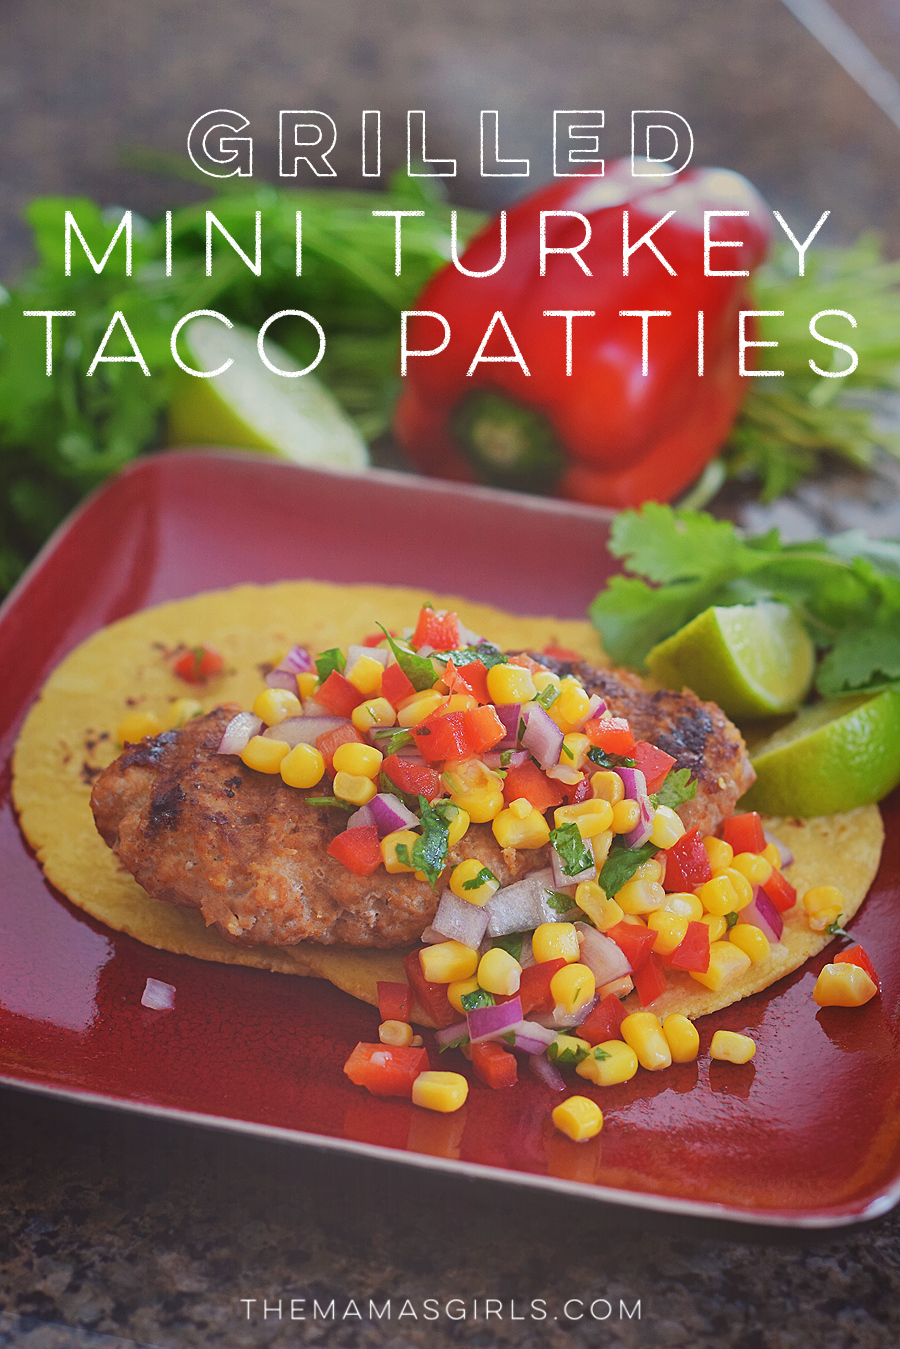 All Whites Grilled Mini Turkey Taco Patties